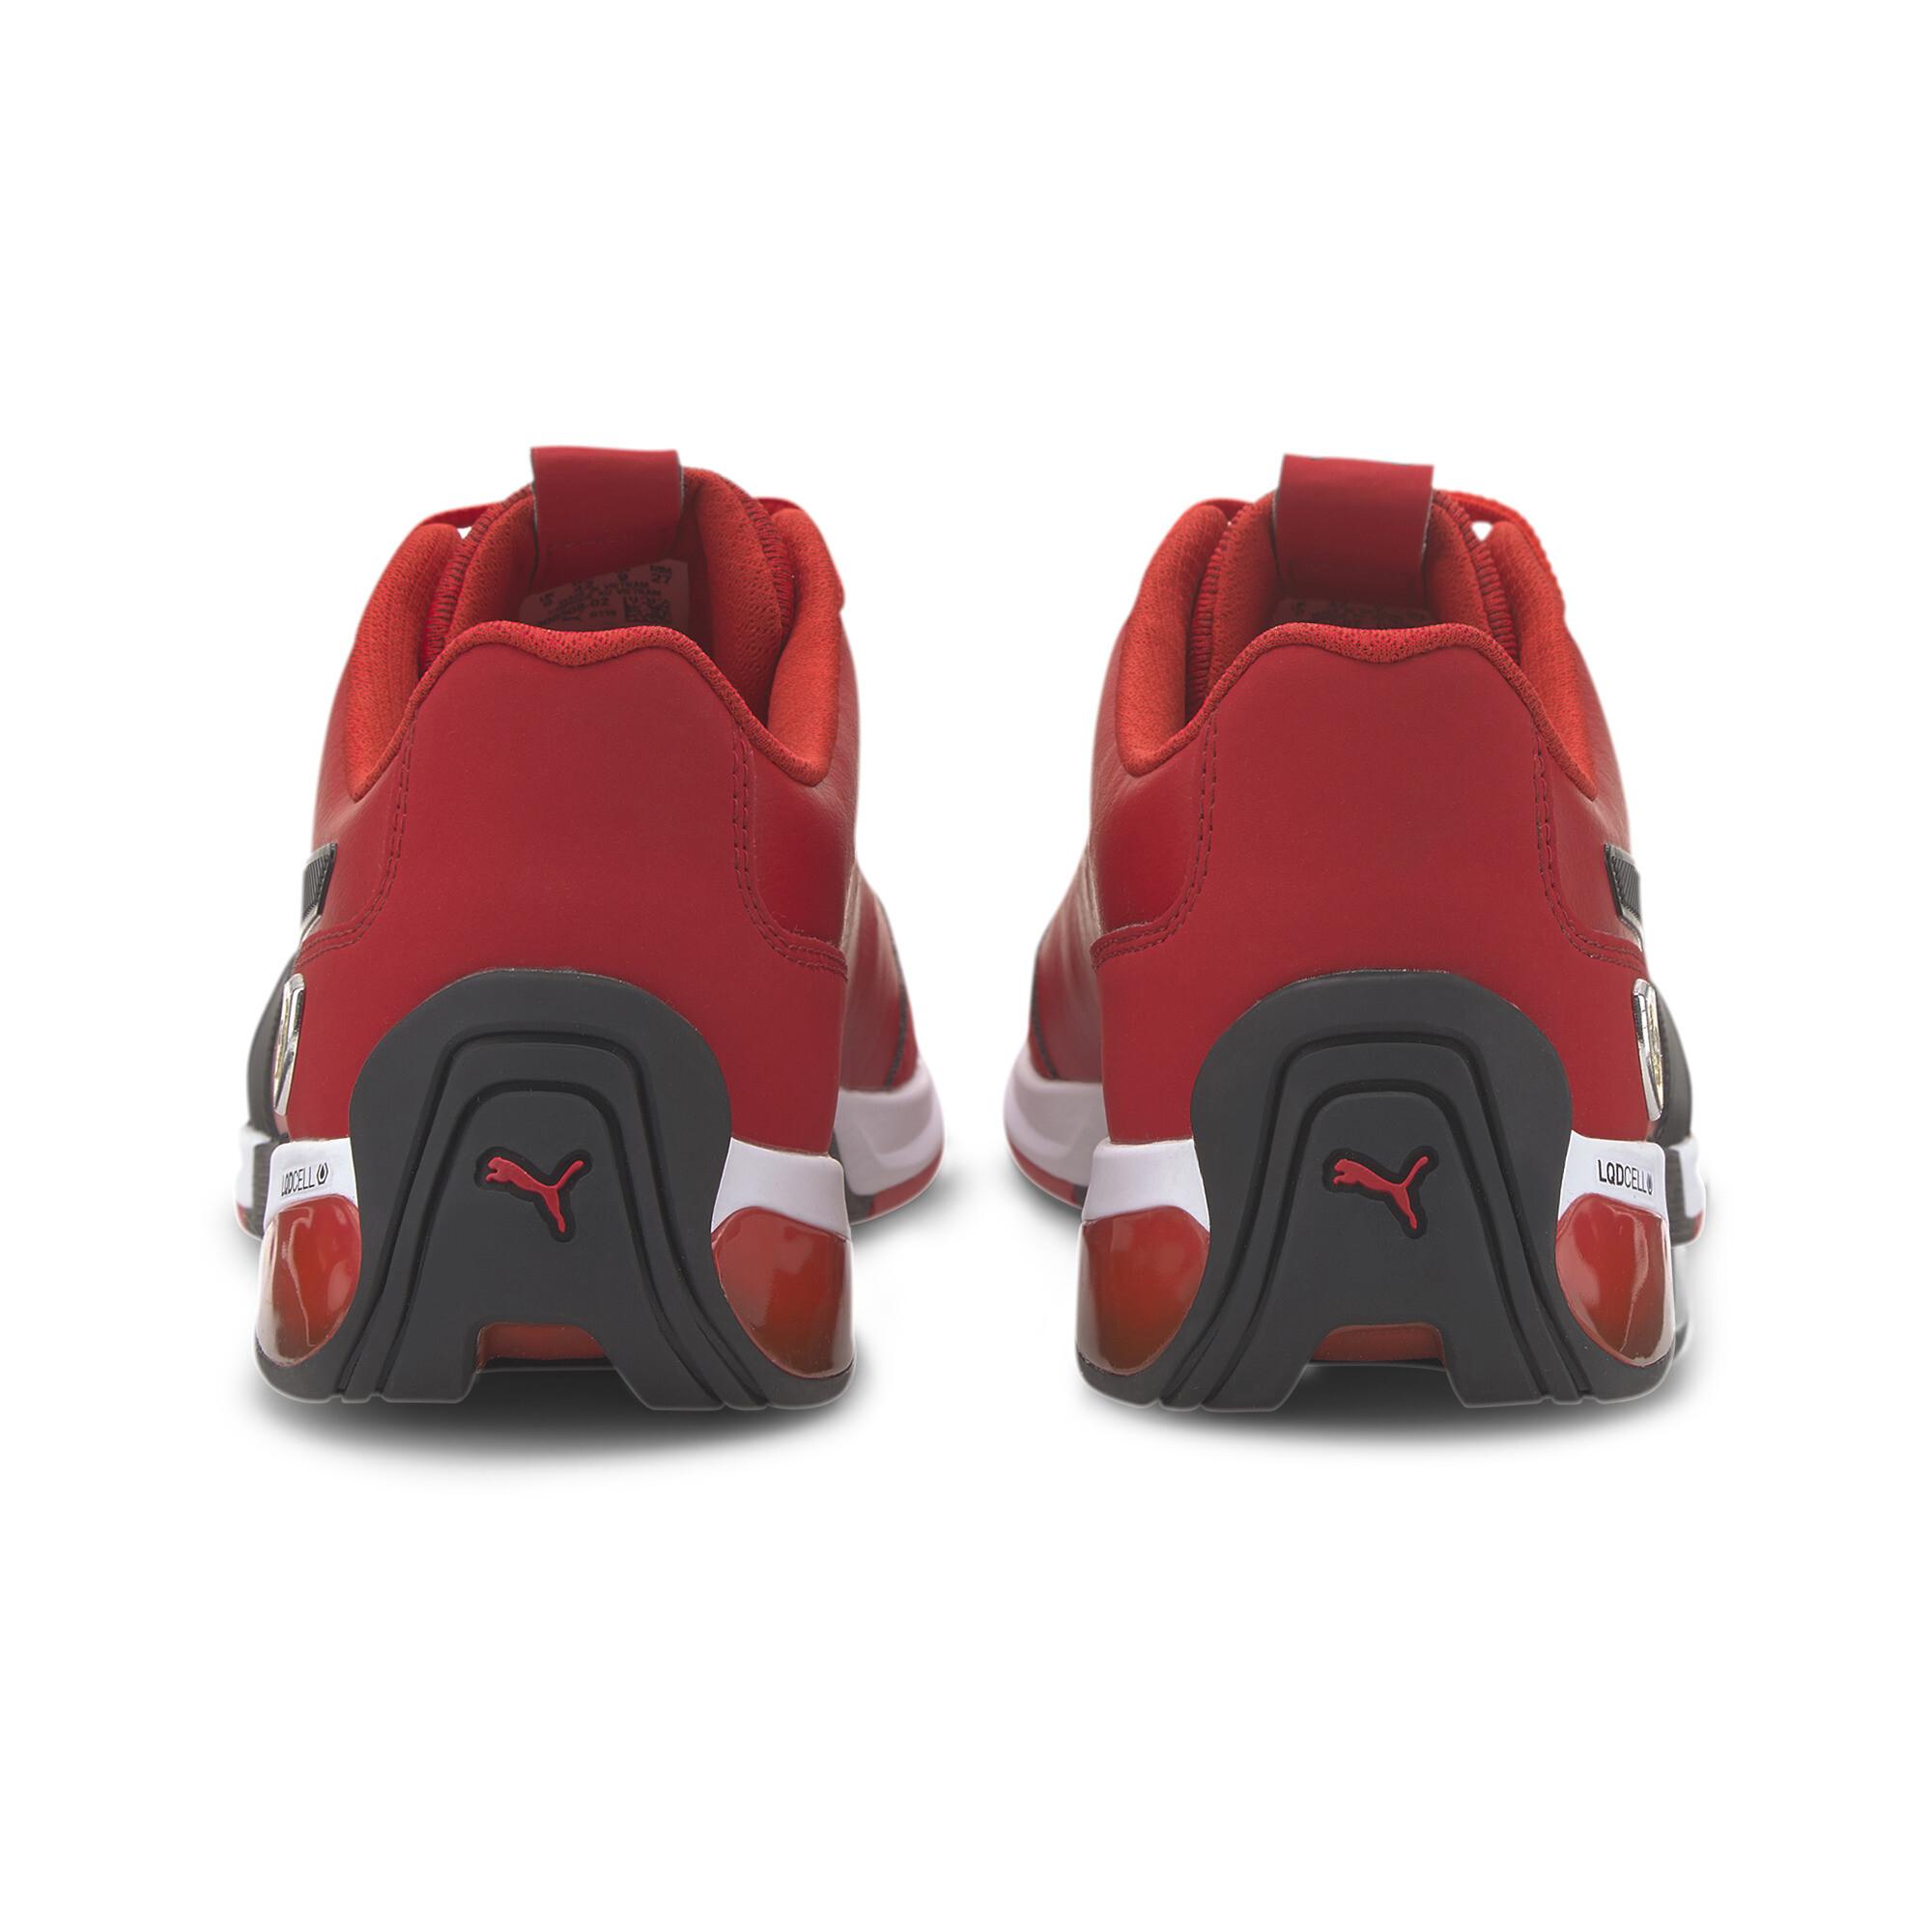 PUMA-Men-039-s-Scuderia-Ferrari-Kart-Cat-X-Motorsport-Shoes thumbnail 11